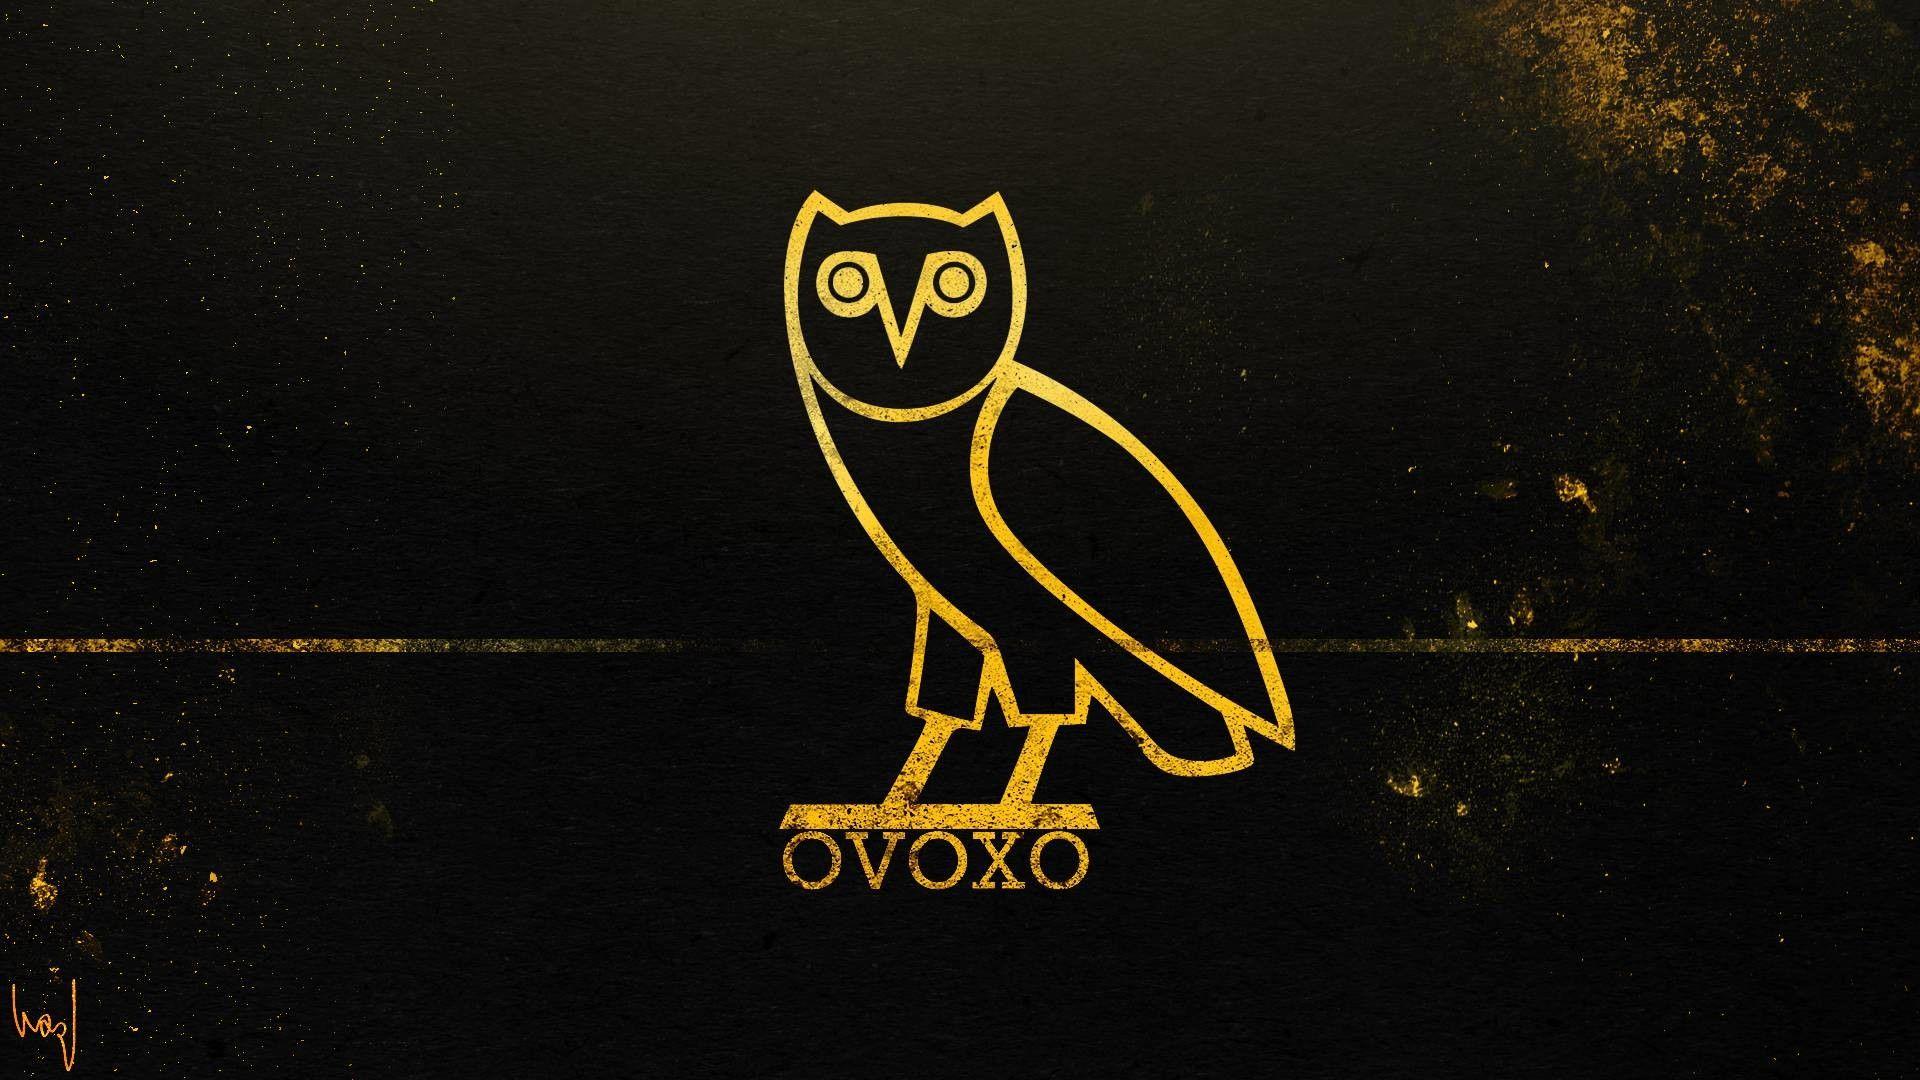 1920x1080 Ovo Logo Drake Ovo Cool Wallpaper Drake Ovo